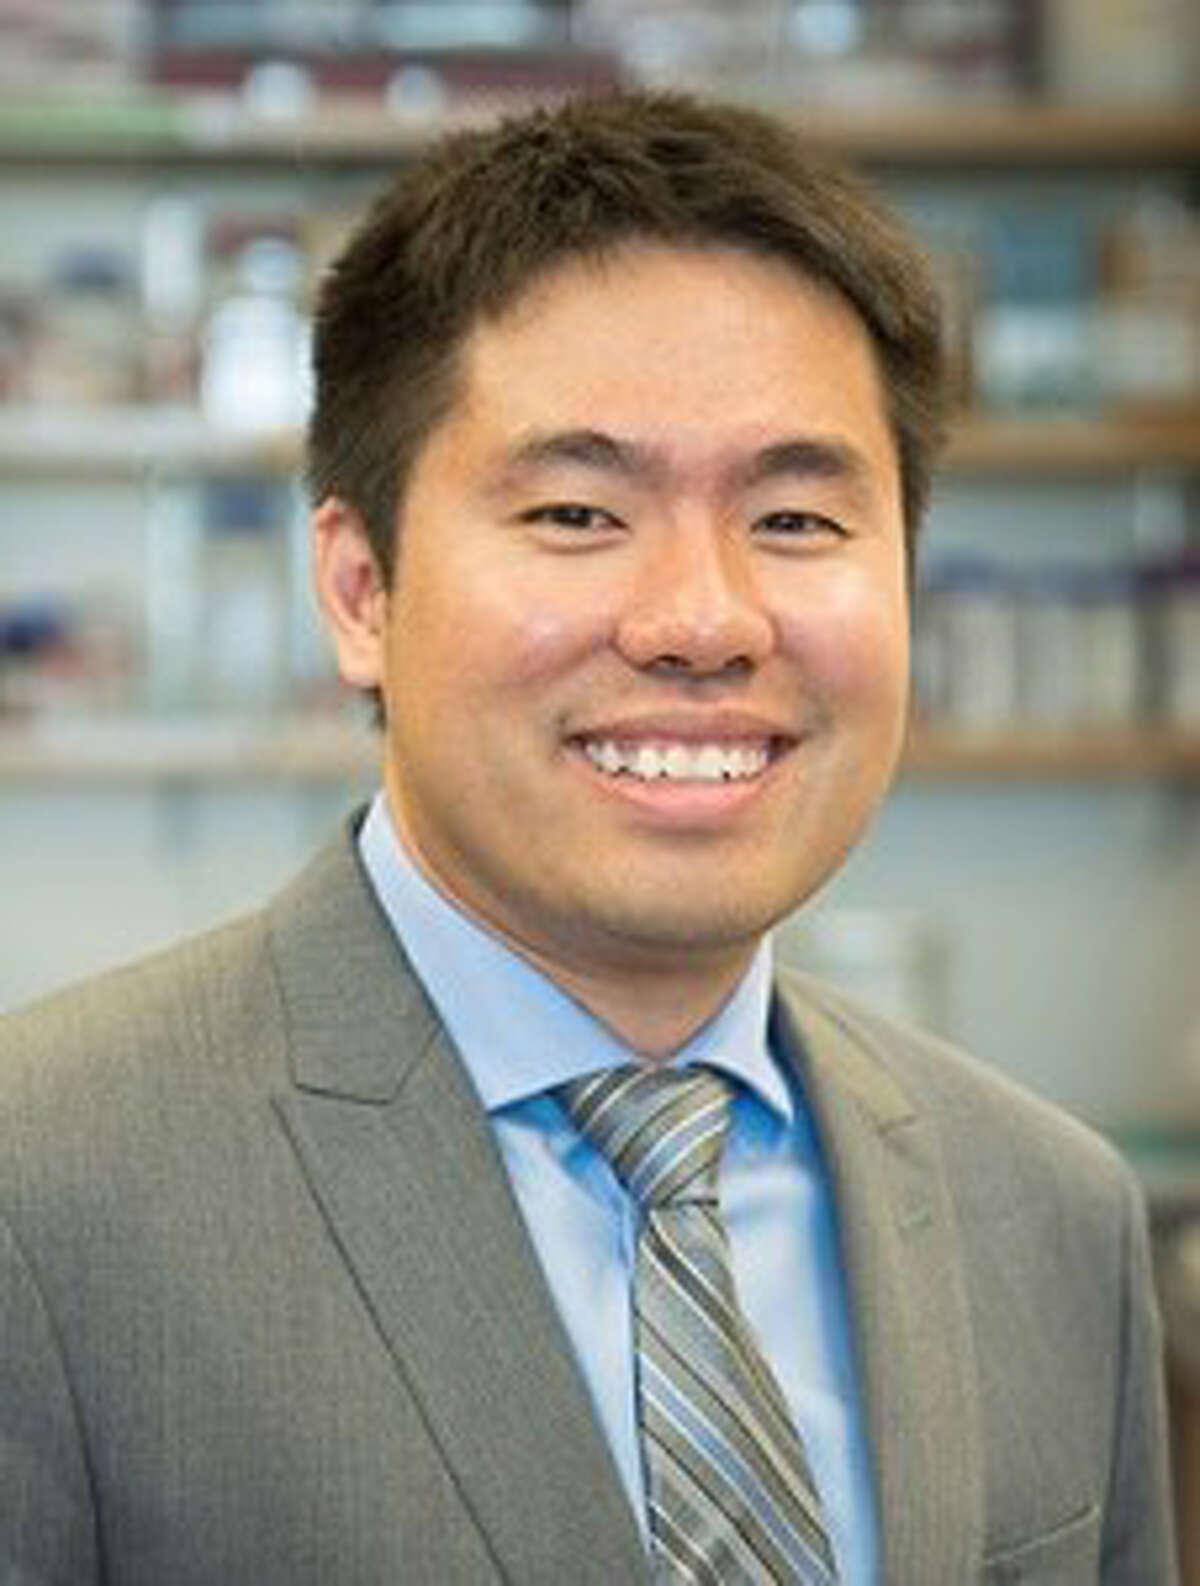 Albert Cheng, 33, Farmington, Scientist, engineer, assistant professor